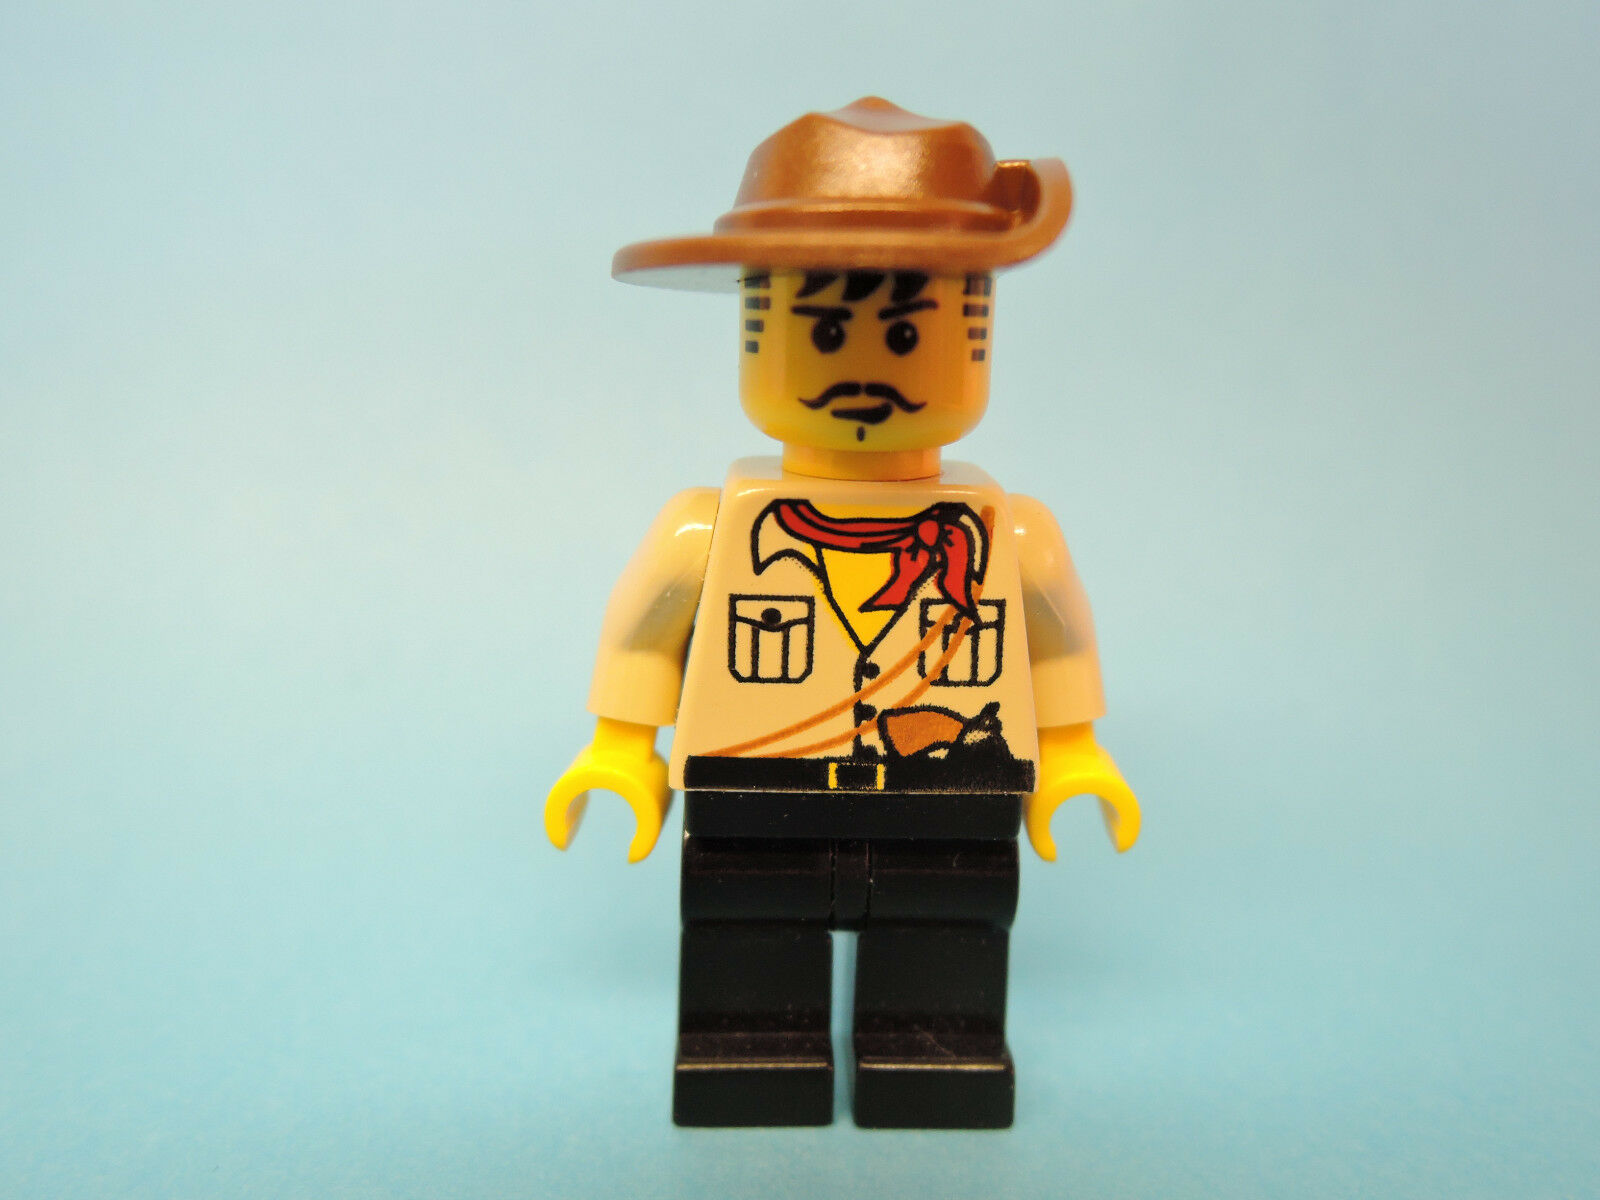 Charles Lightning adv006 aus Set 5934 5956 5987 LEGO 3 x Figur Minifigur Dr